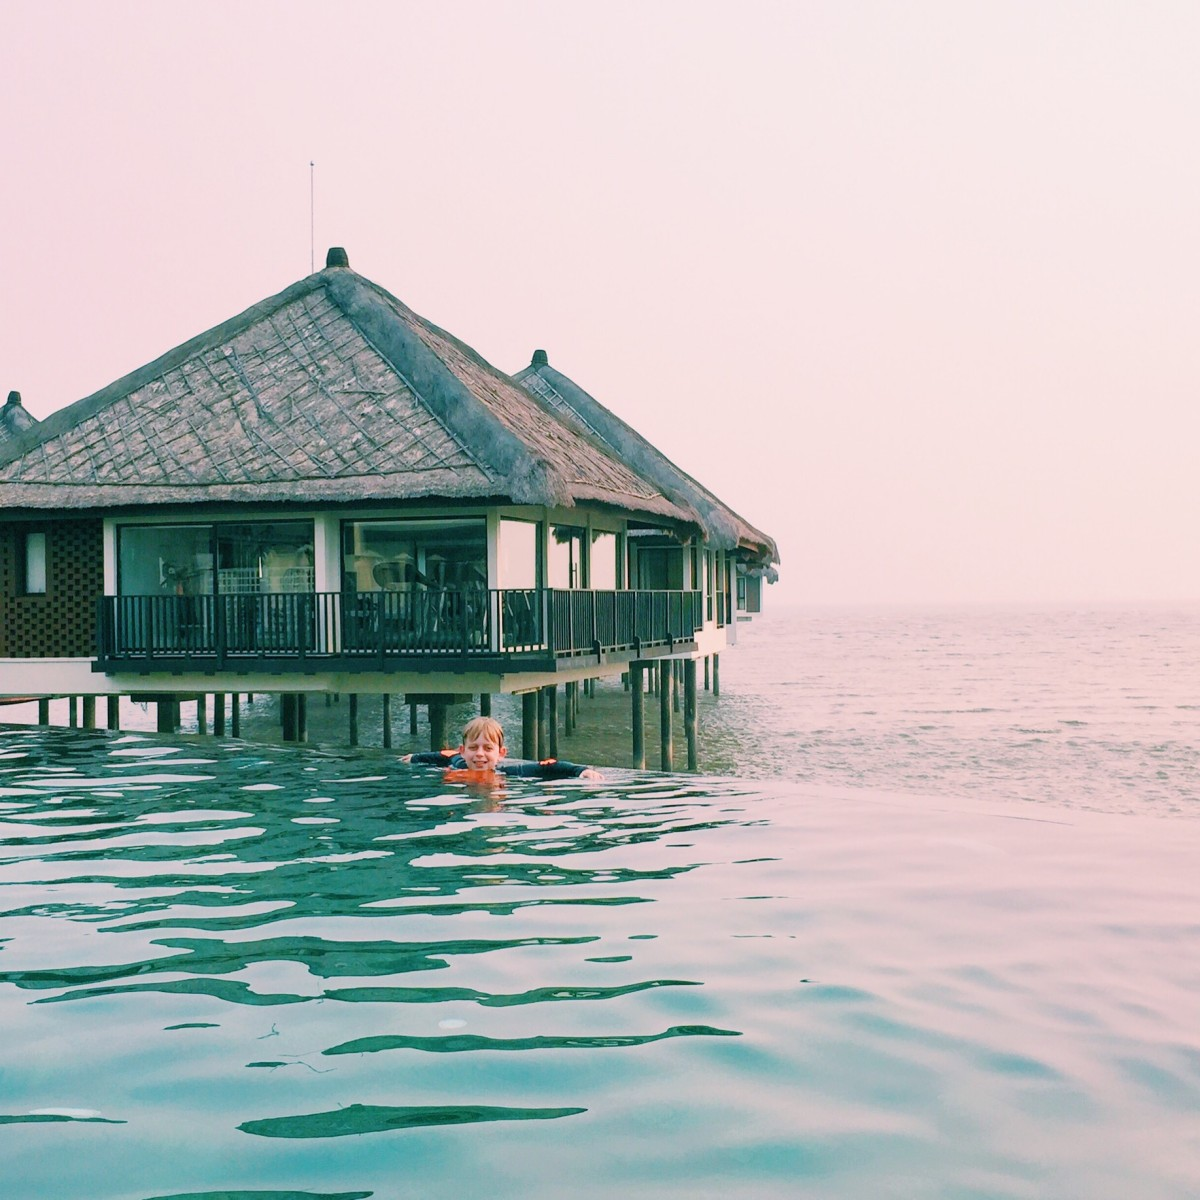 Malaysia Beaches: The Perfect Beach Hotel Near Kuala Lumpur